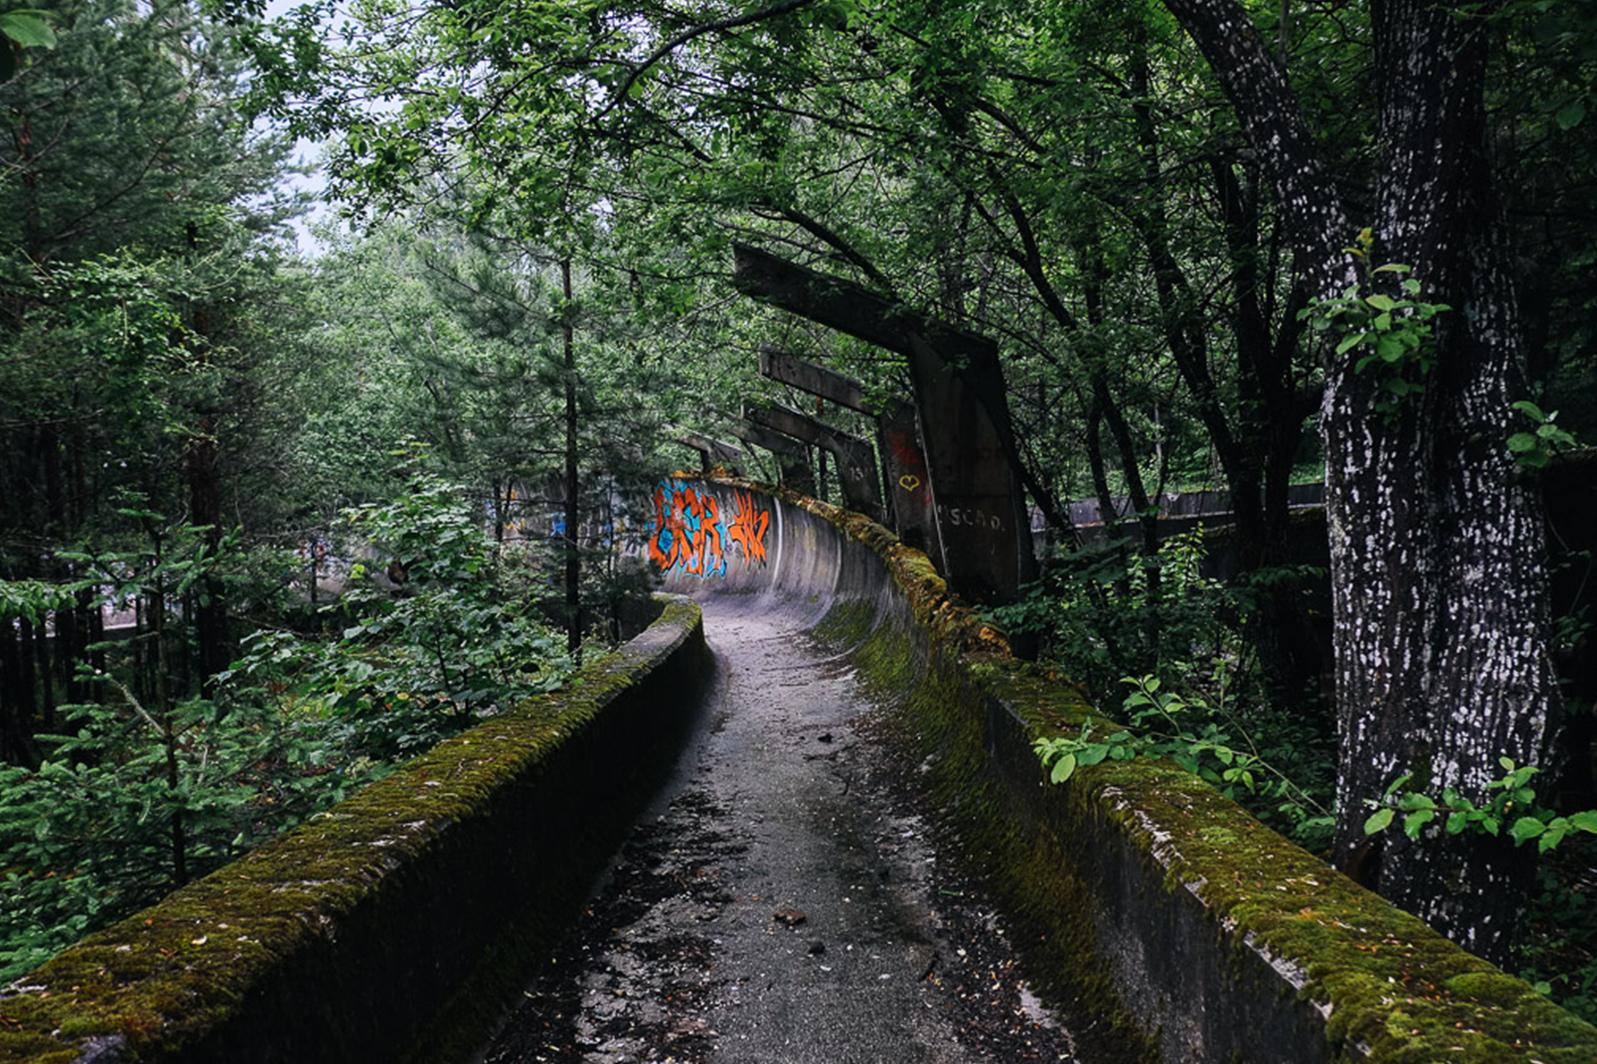 foret jo sarajevo urbex abandon - Berlin, Sarajevo, Athènes : les sites des Jeux Olympiques version urbex